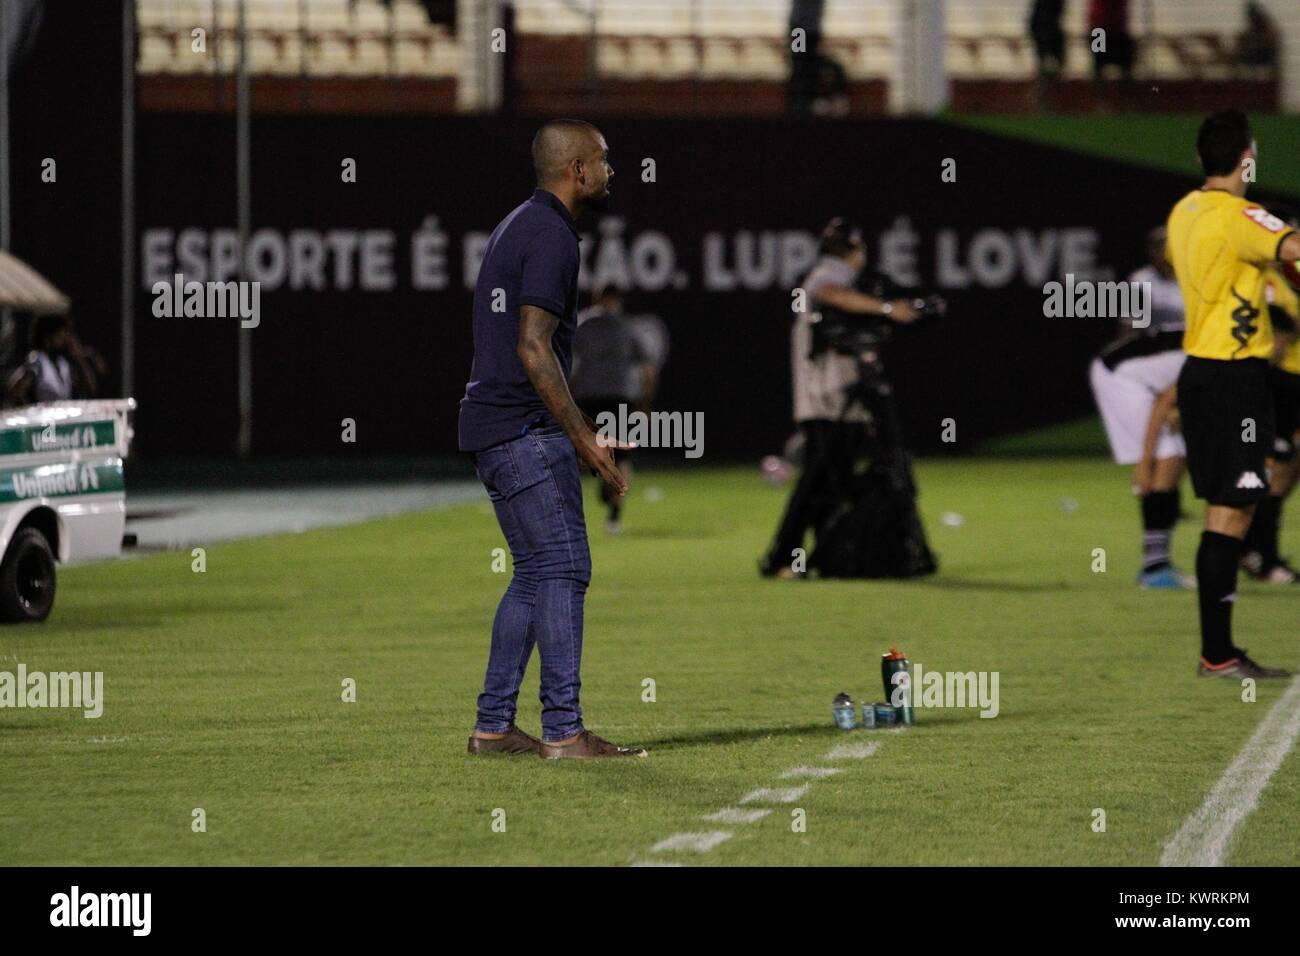 Araraquara Brazil 05th Jan 2018 Corinthians Coach Dyego Coelho During A